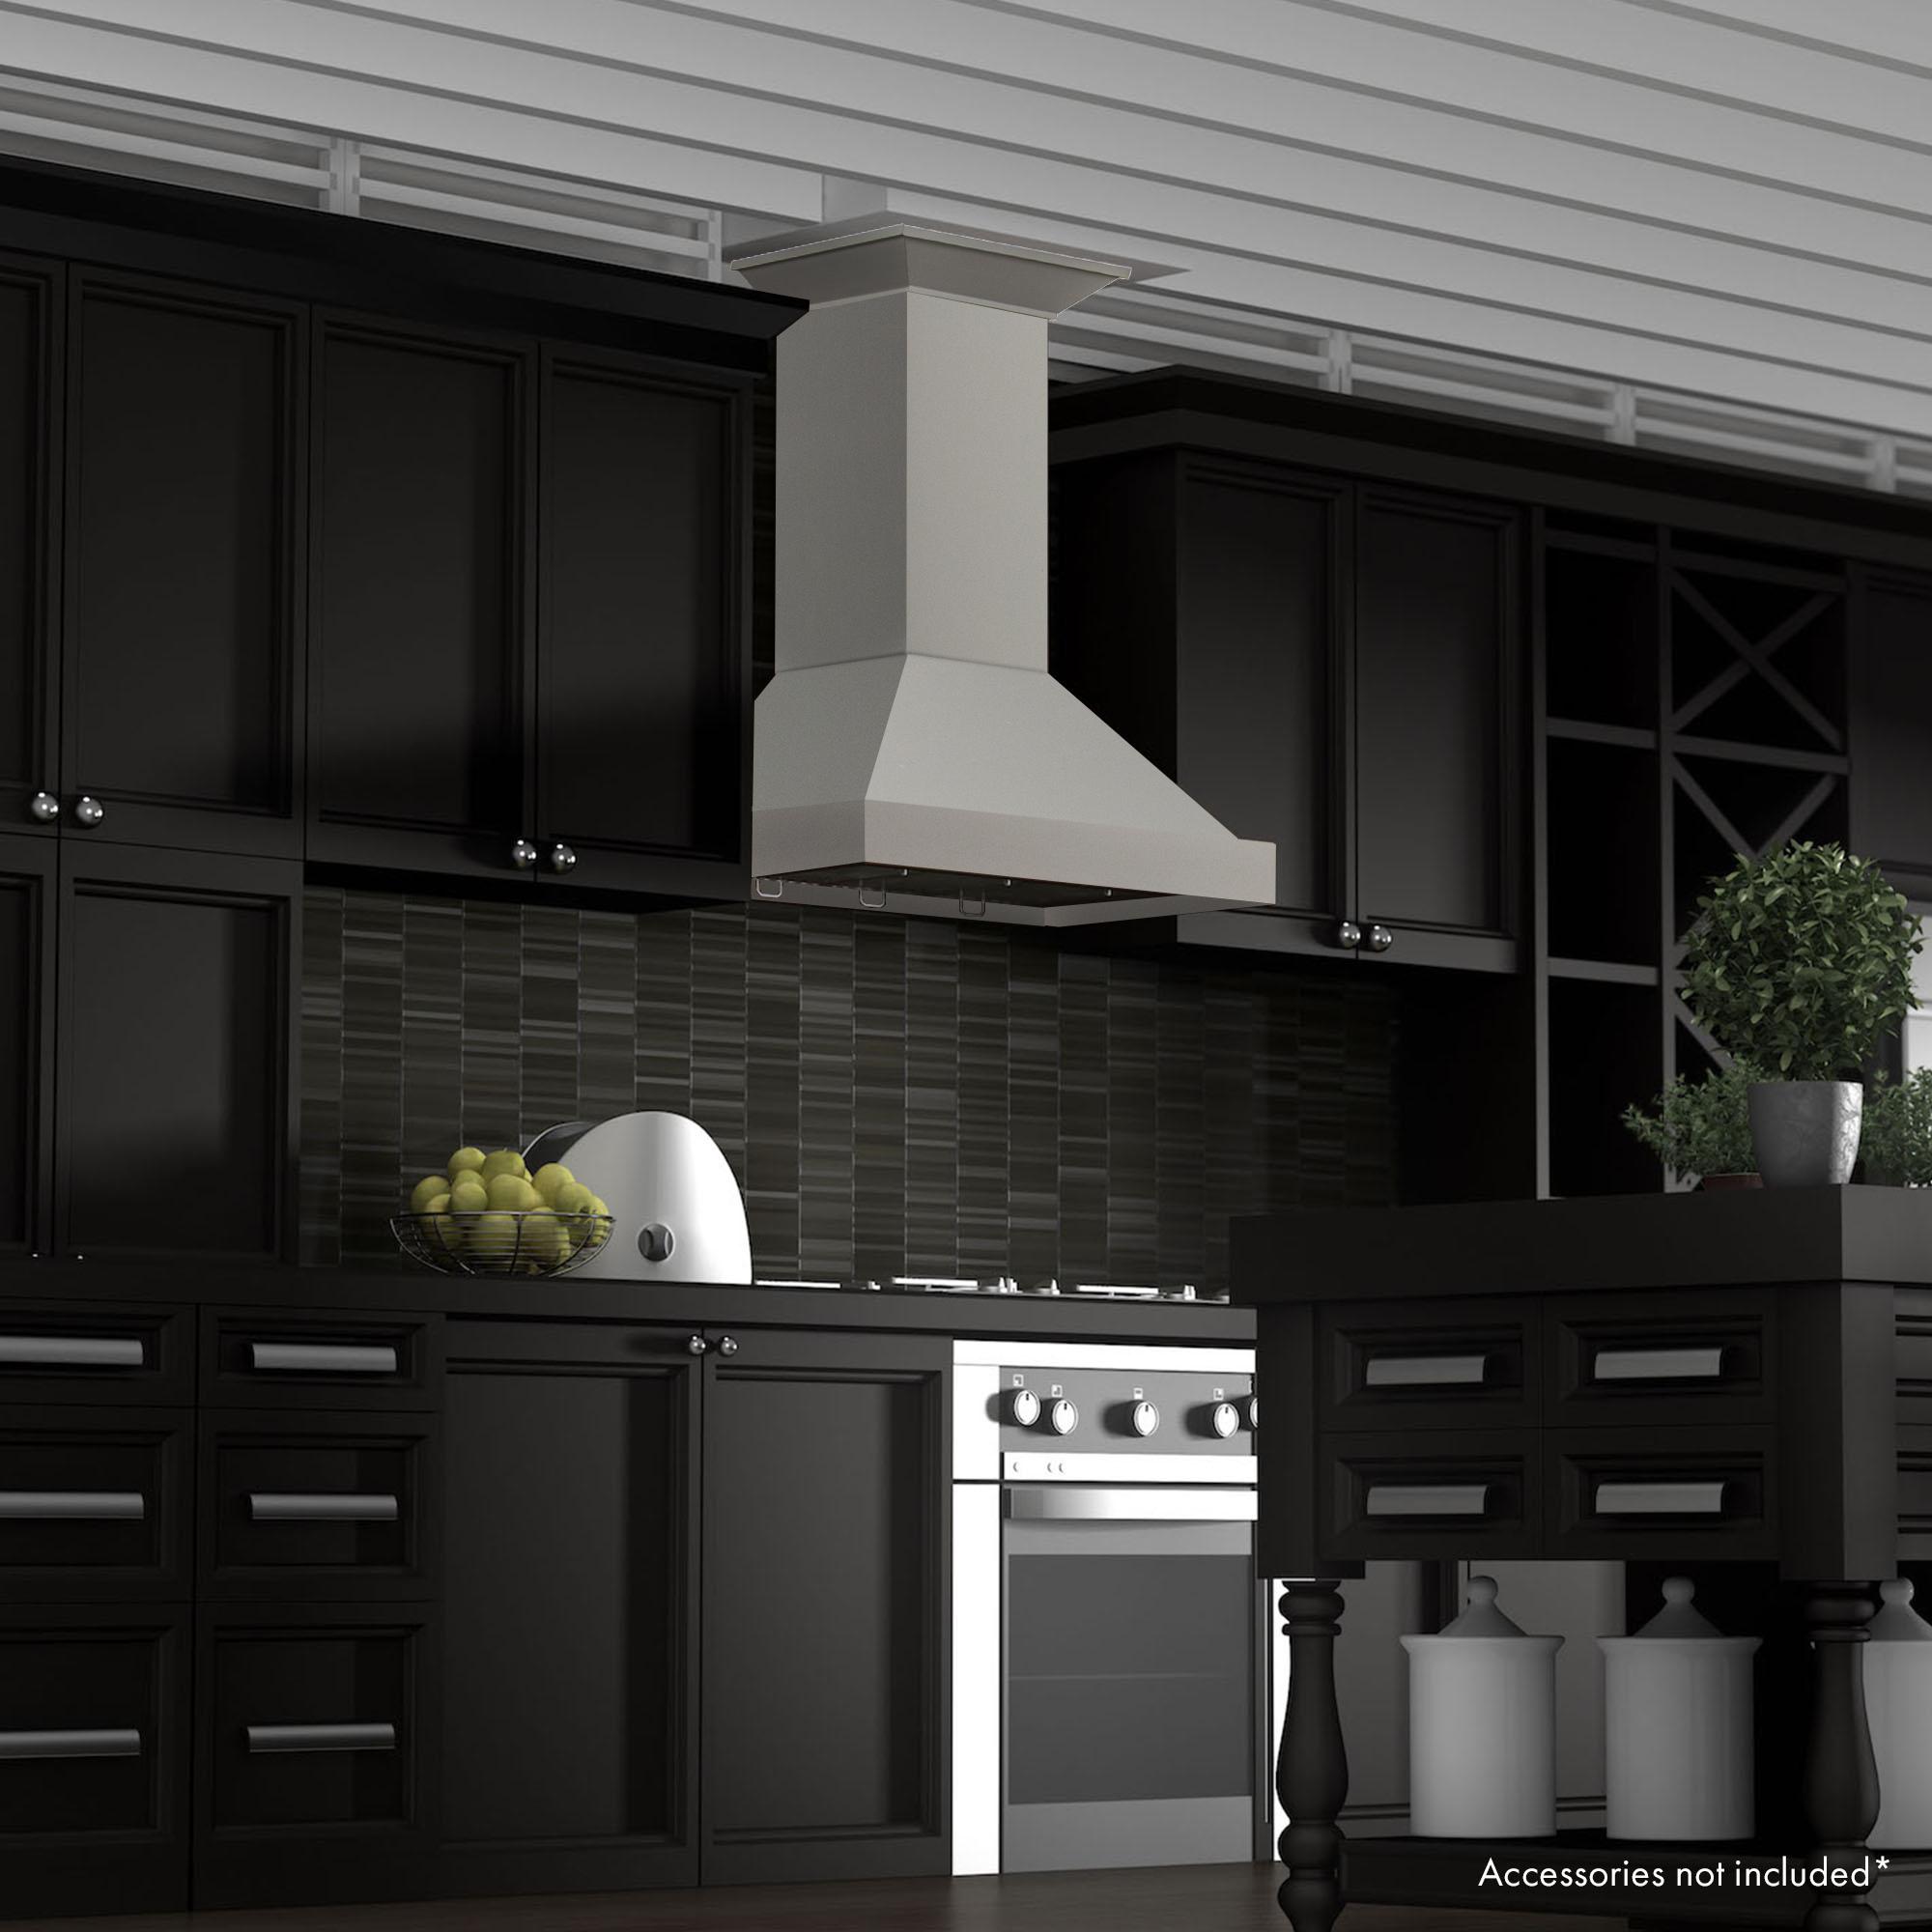 zline-designer-wood-range-hood-KBUU-kitchen_new.jpg